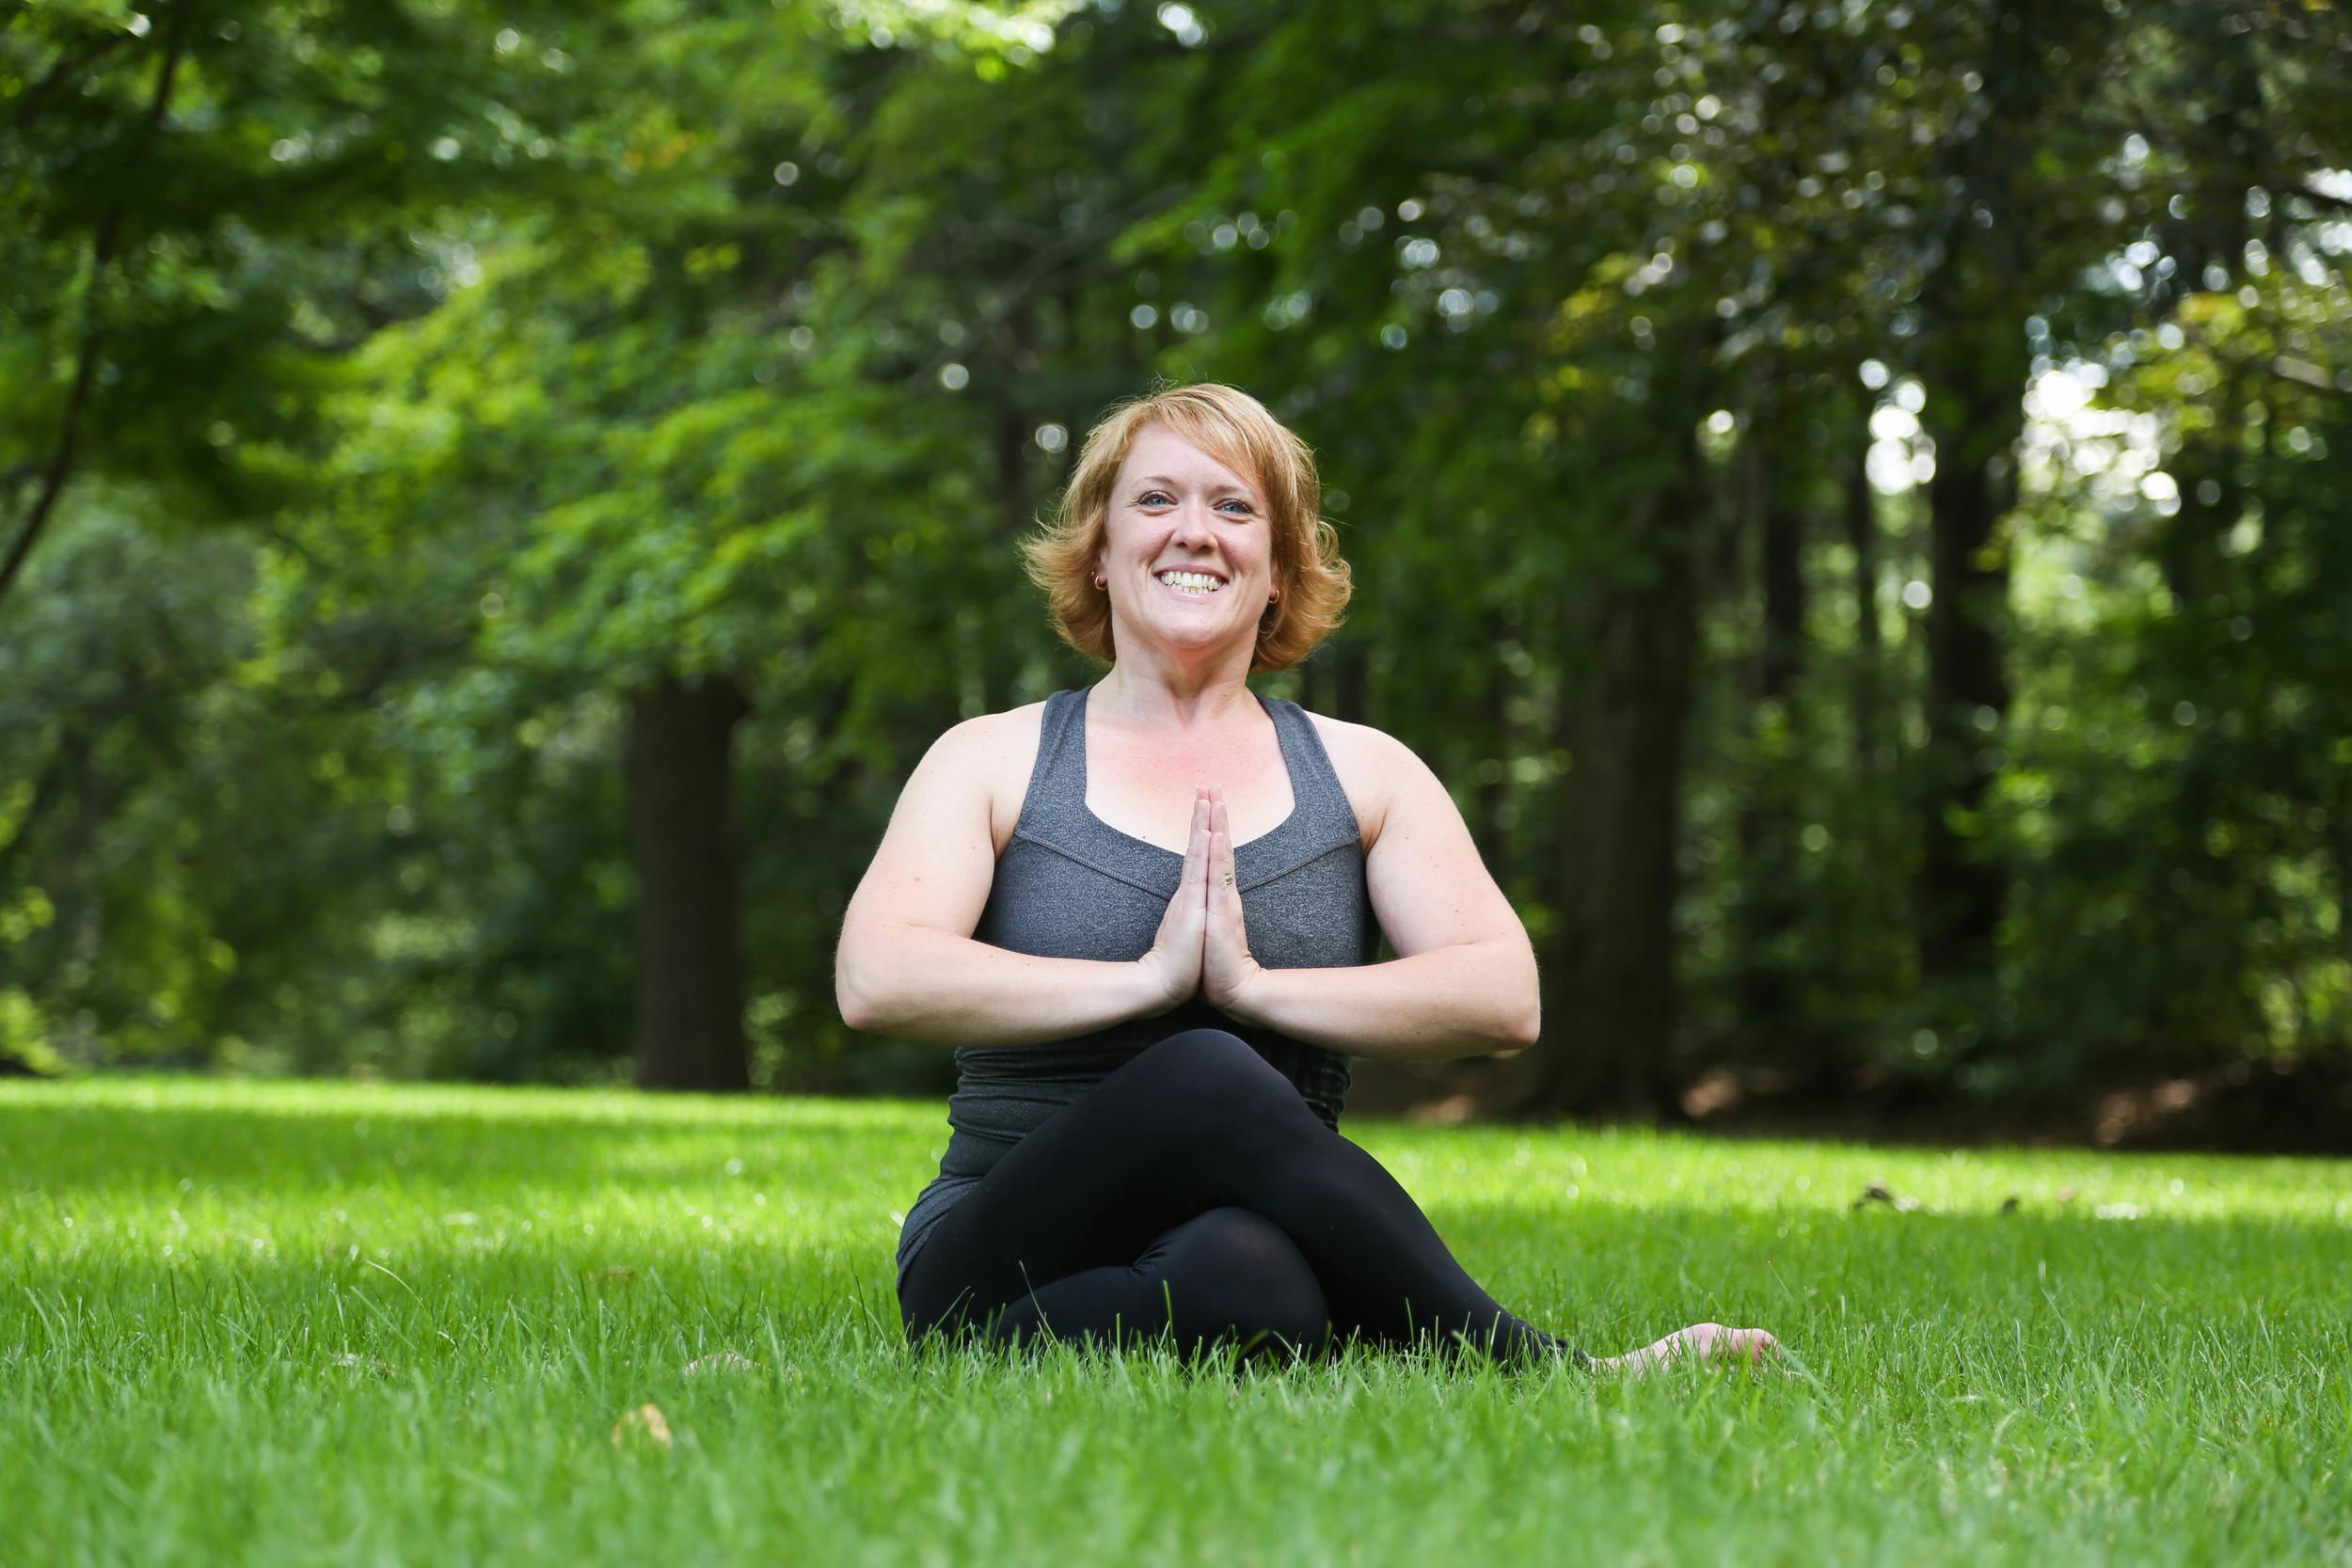 Tracy_Rodriguez_Photography_Yoga_Portfolio_Radiant_Yoga_Boston_TeacherTraining-3559.jpg